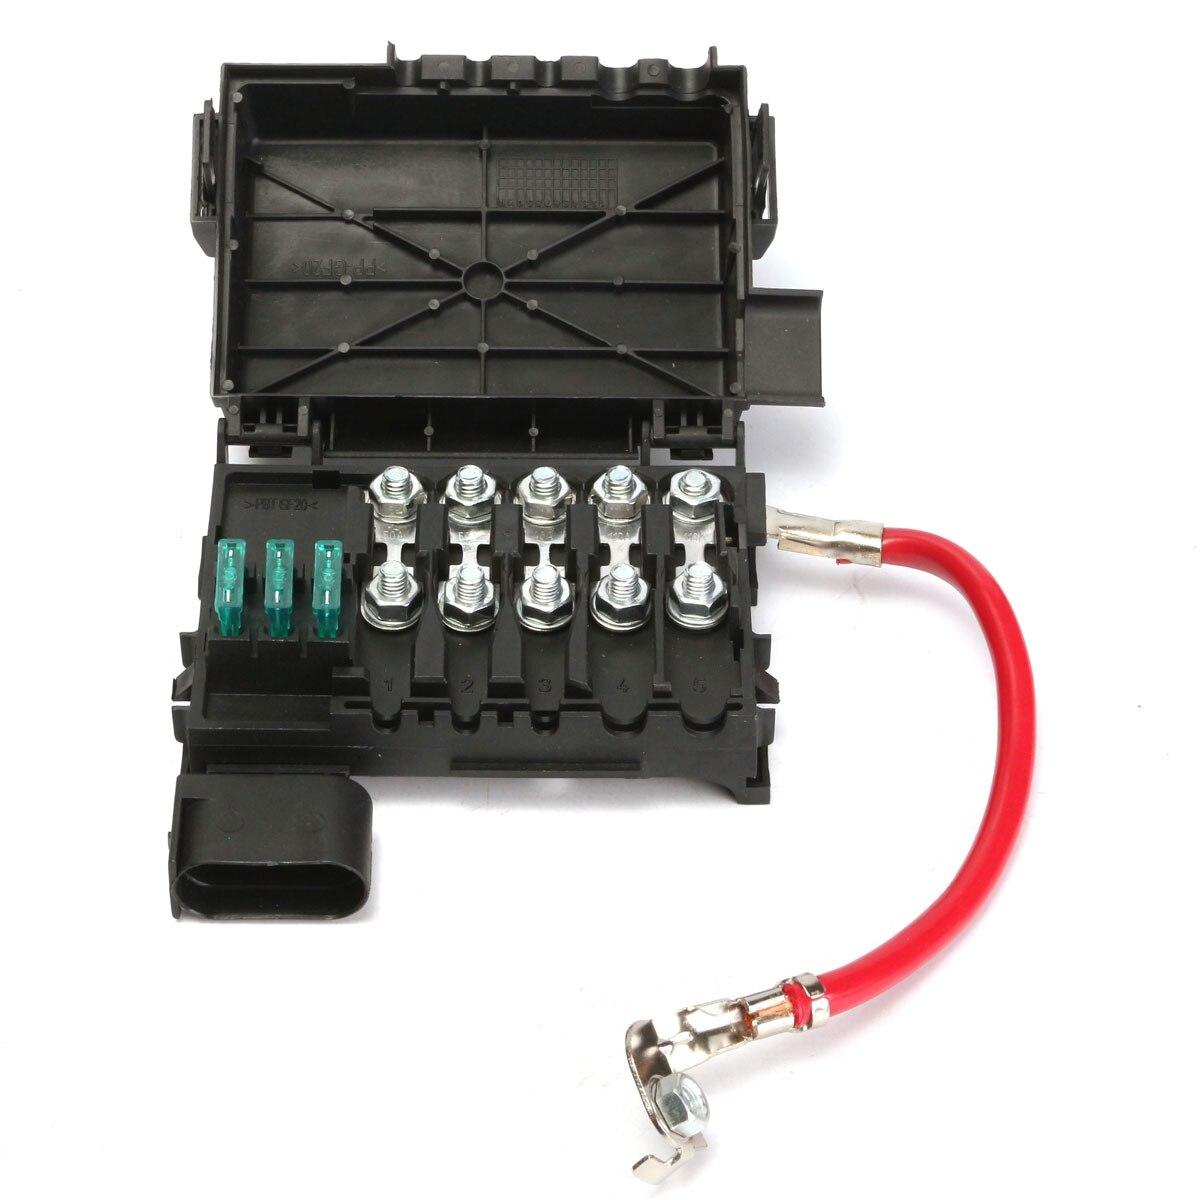 Oem Automotive Fuse Block Terminals Wiring Diagram For Light Switch \u2022  12V Fuse Box Location 12v Fuse Box Ebay